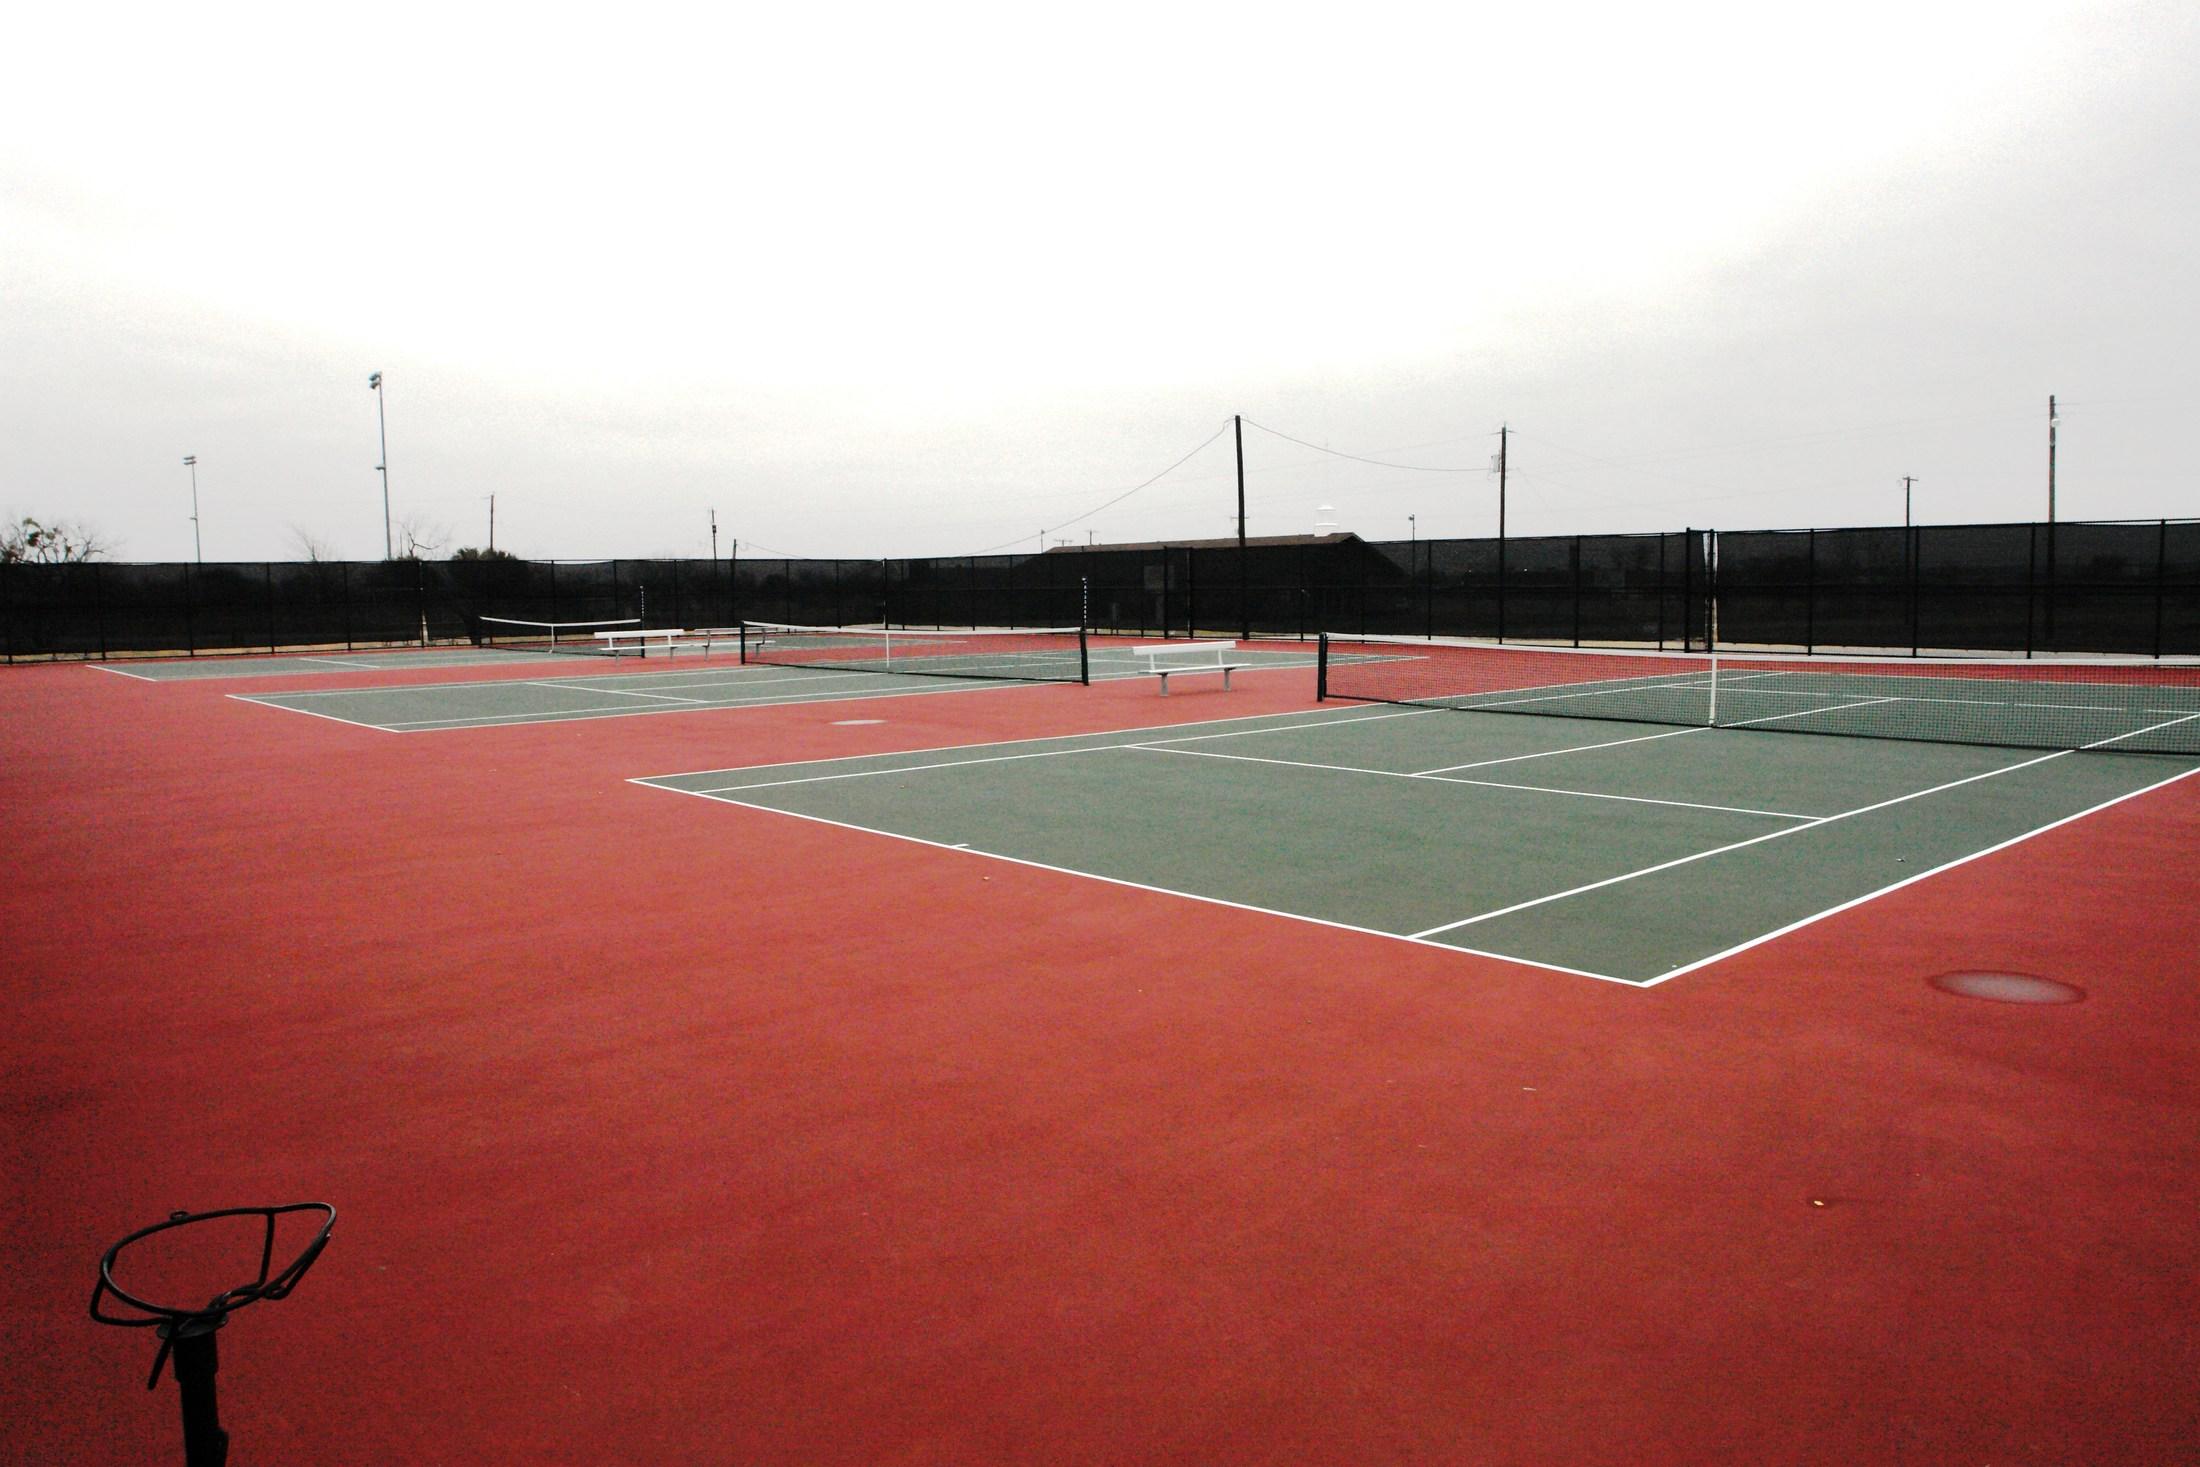 MWHS Tennis Courts